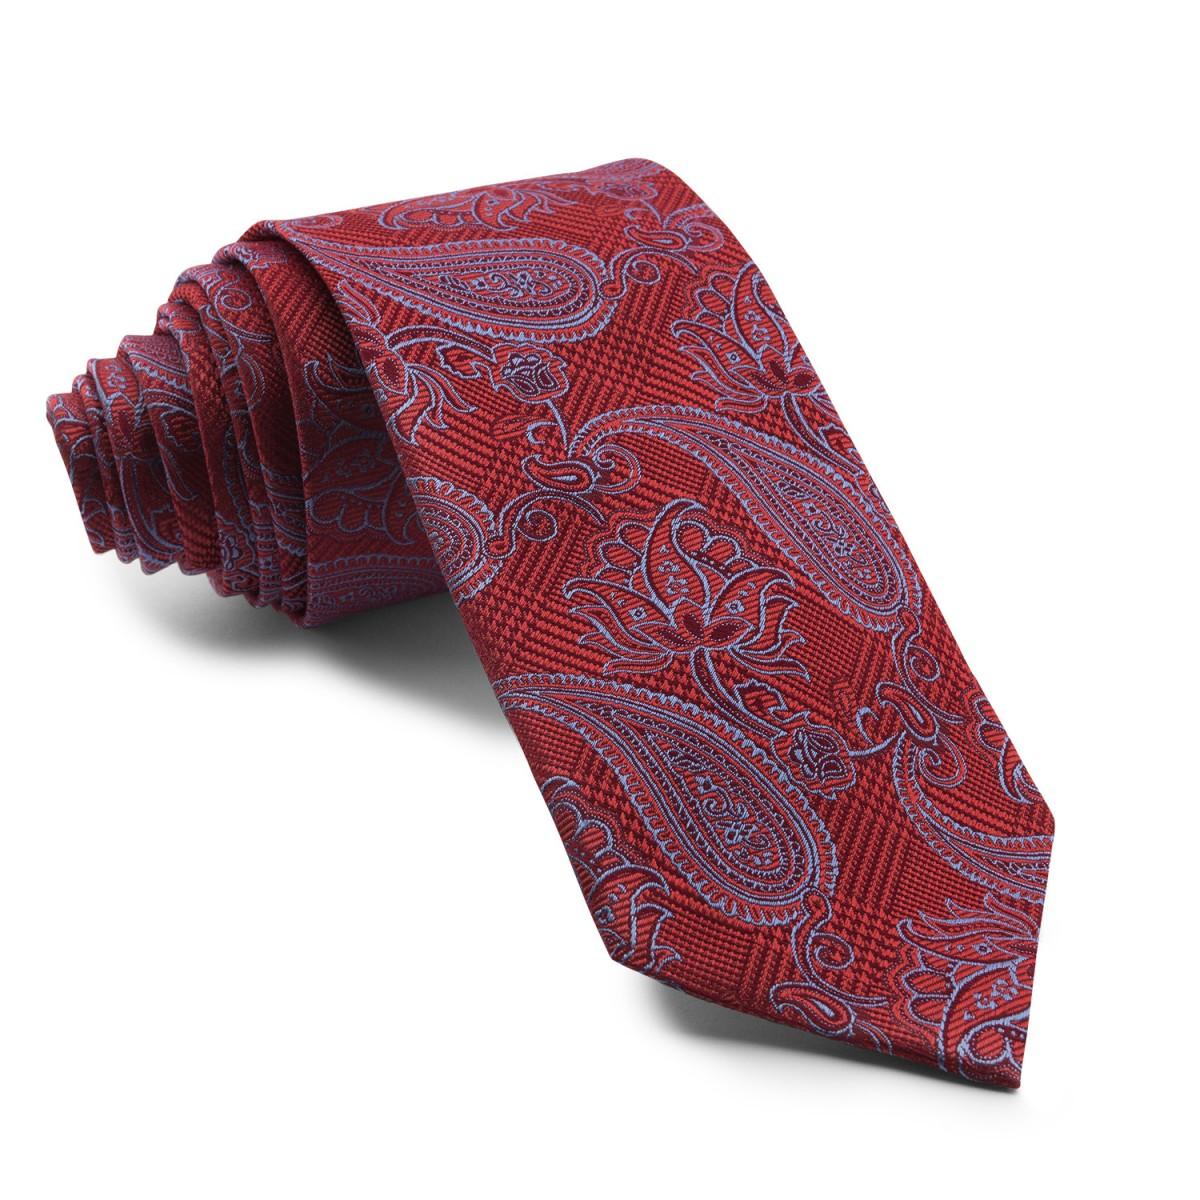 Corbata-Burdeos-Cachemir-con-dibujos